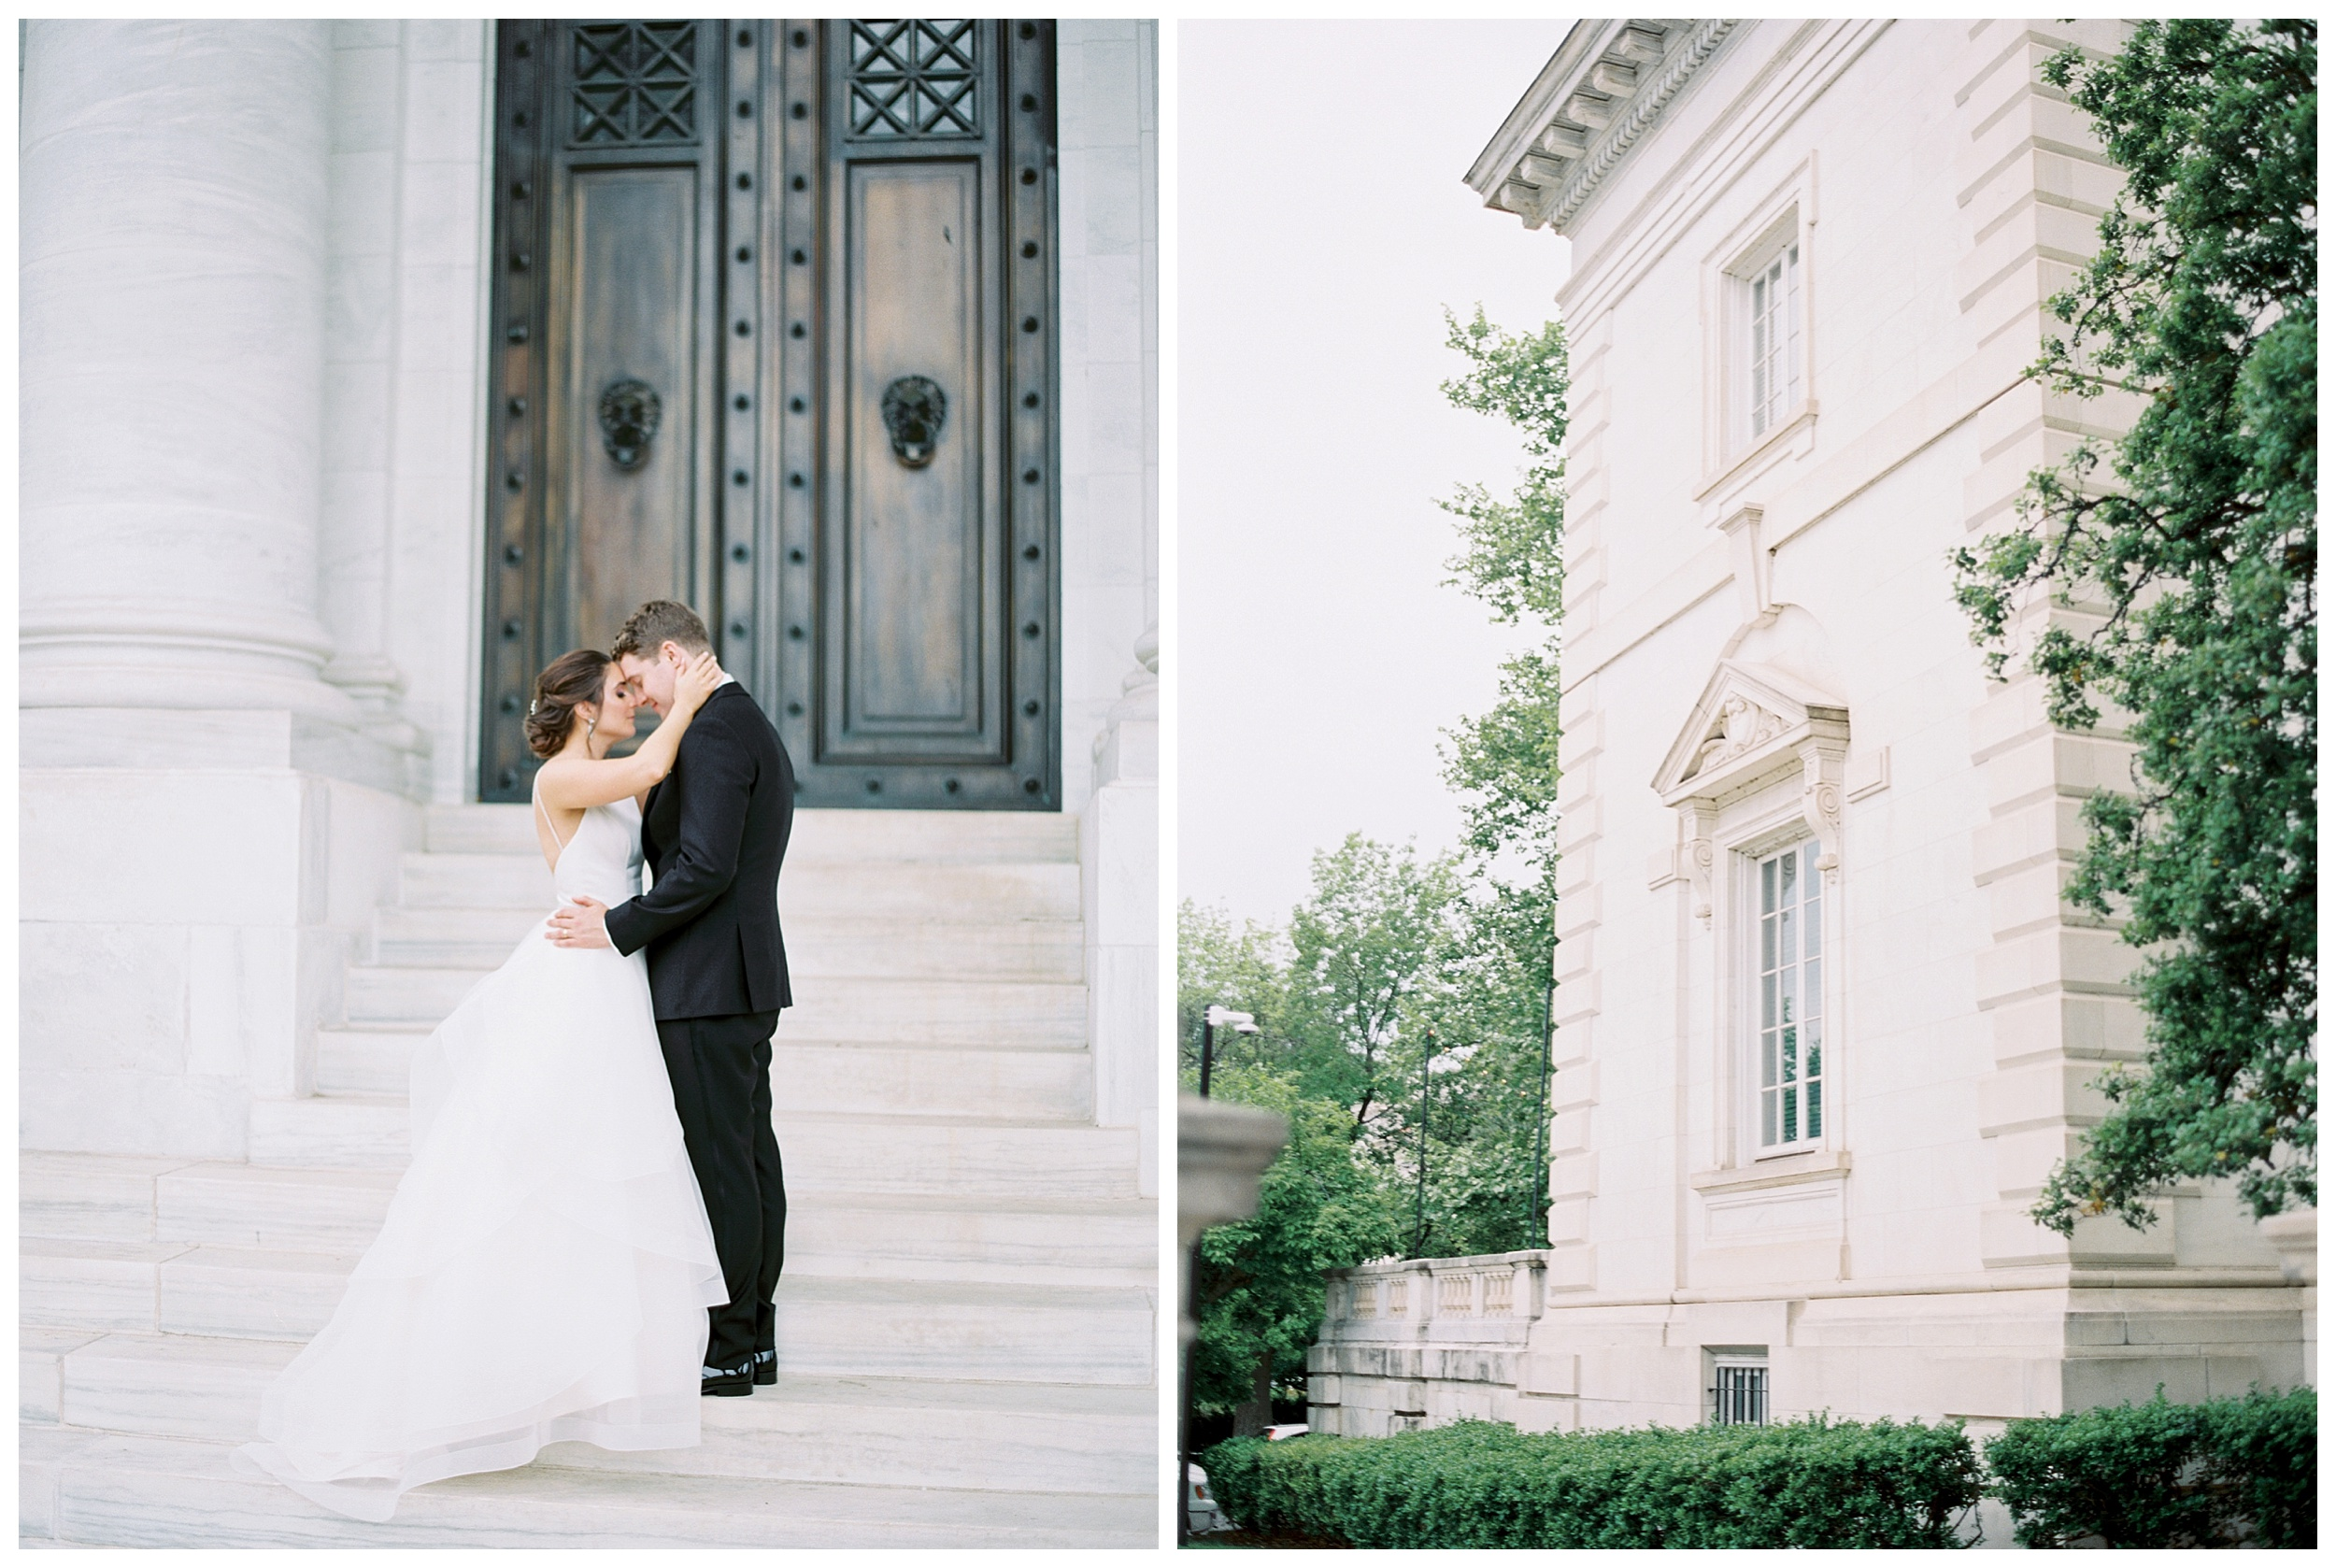 DAR Constitution Hall Wedding Wedding | Daughters of the American Revolution Wedding | District of Columbia Film Wedding Photographer Kir Tuben_0116.jpg